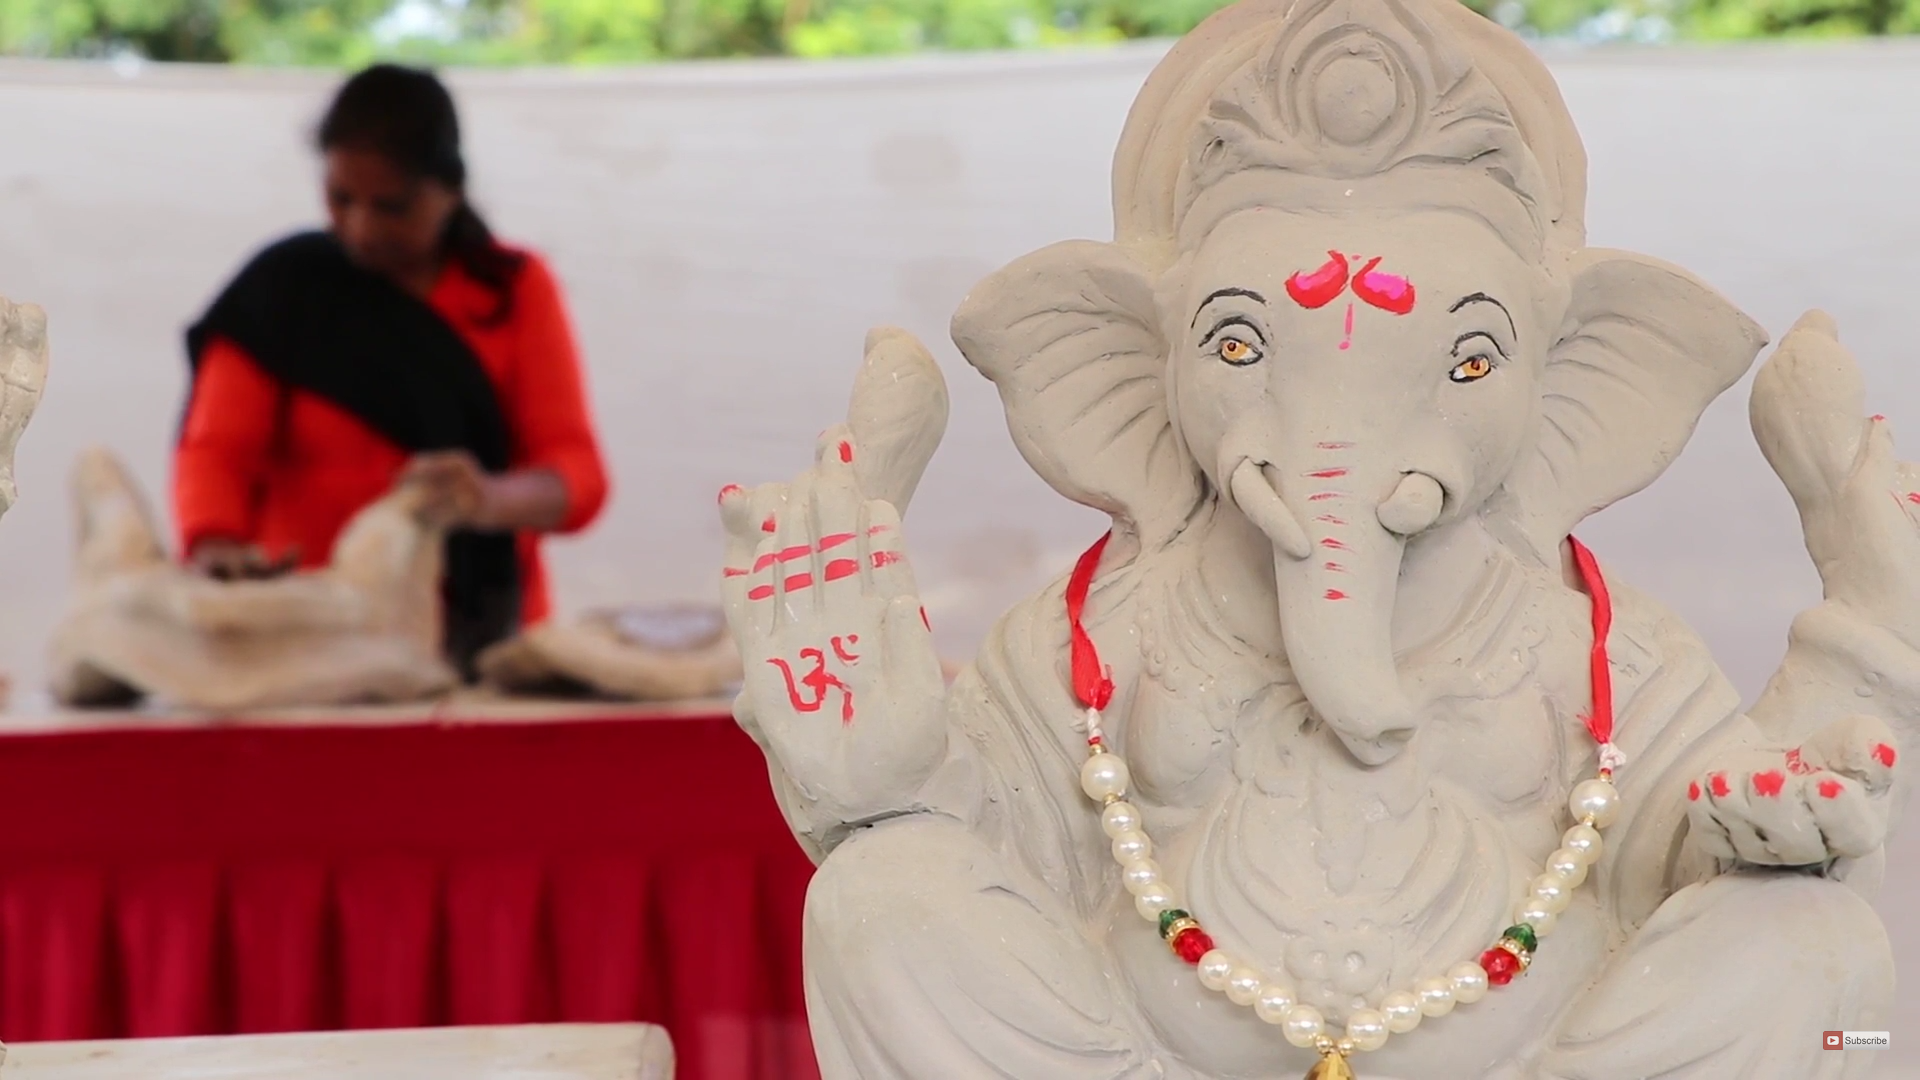 Eco-friendly Ganesh Utsav - an Initiative by Surat Municipal Corporation